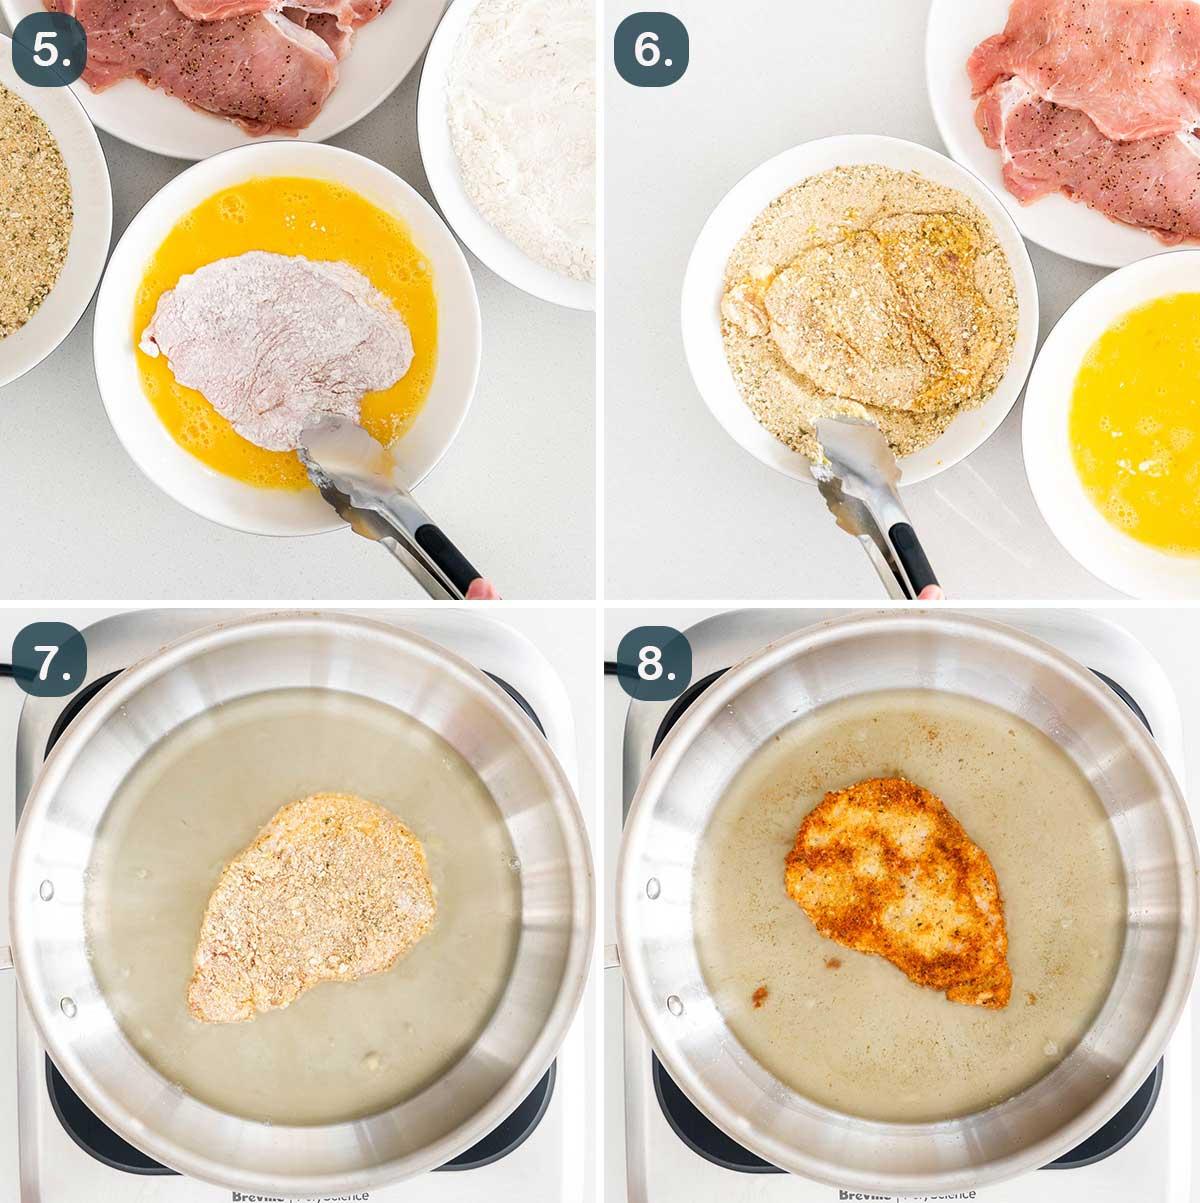 process shots showing how to make pork schnitzel.